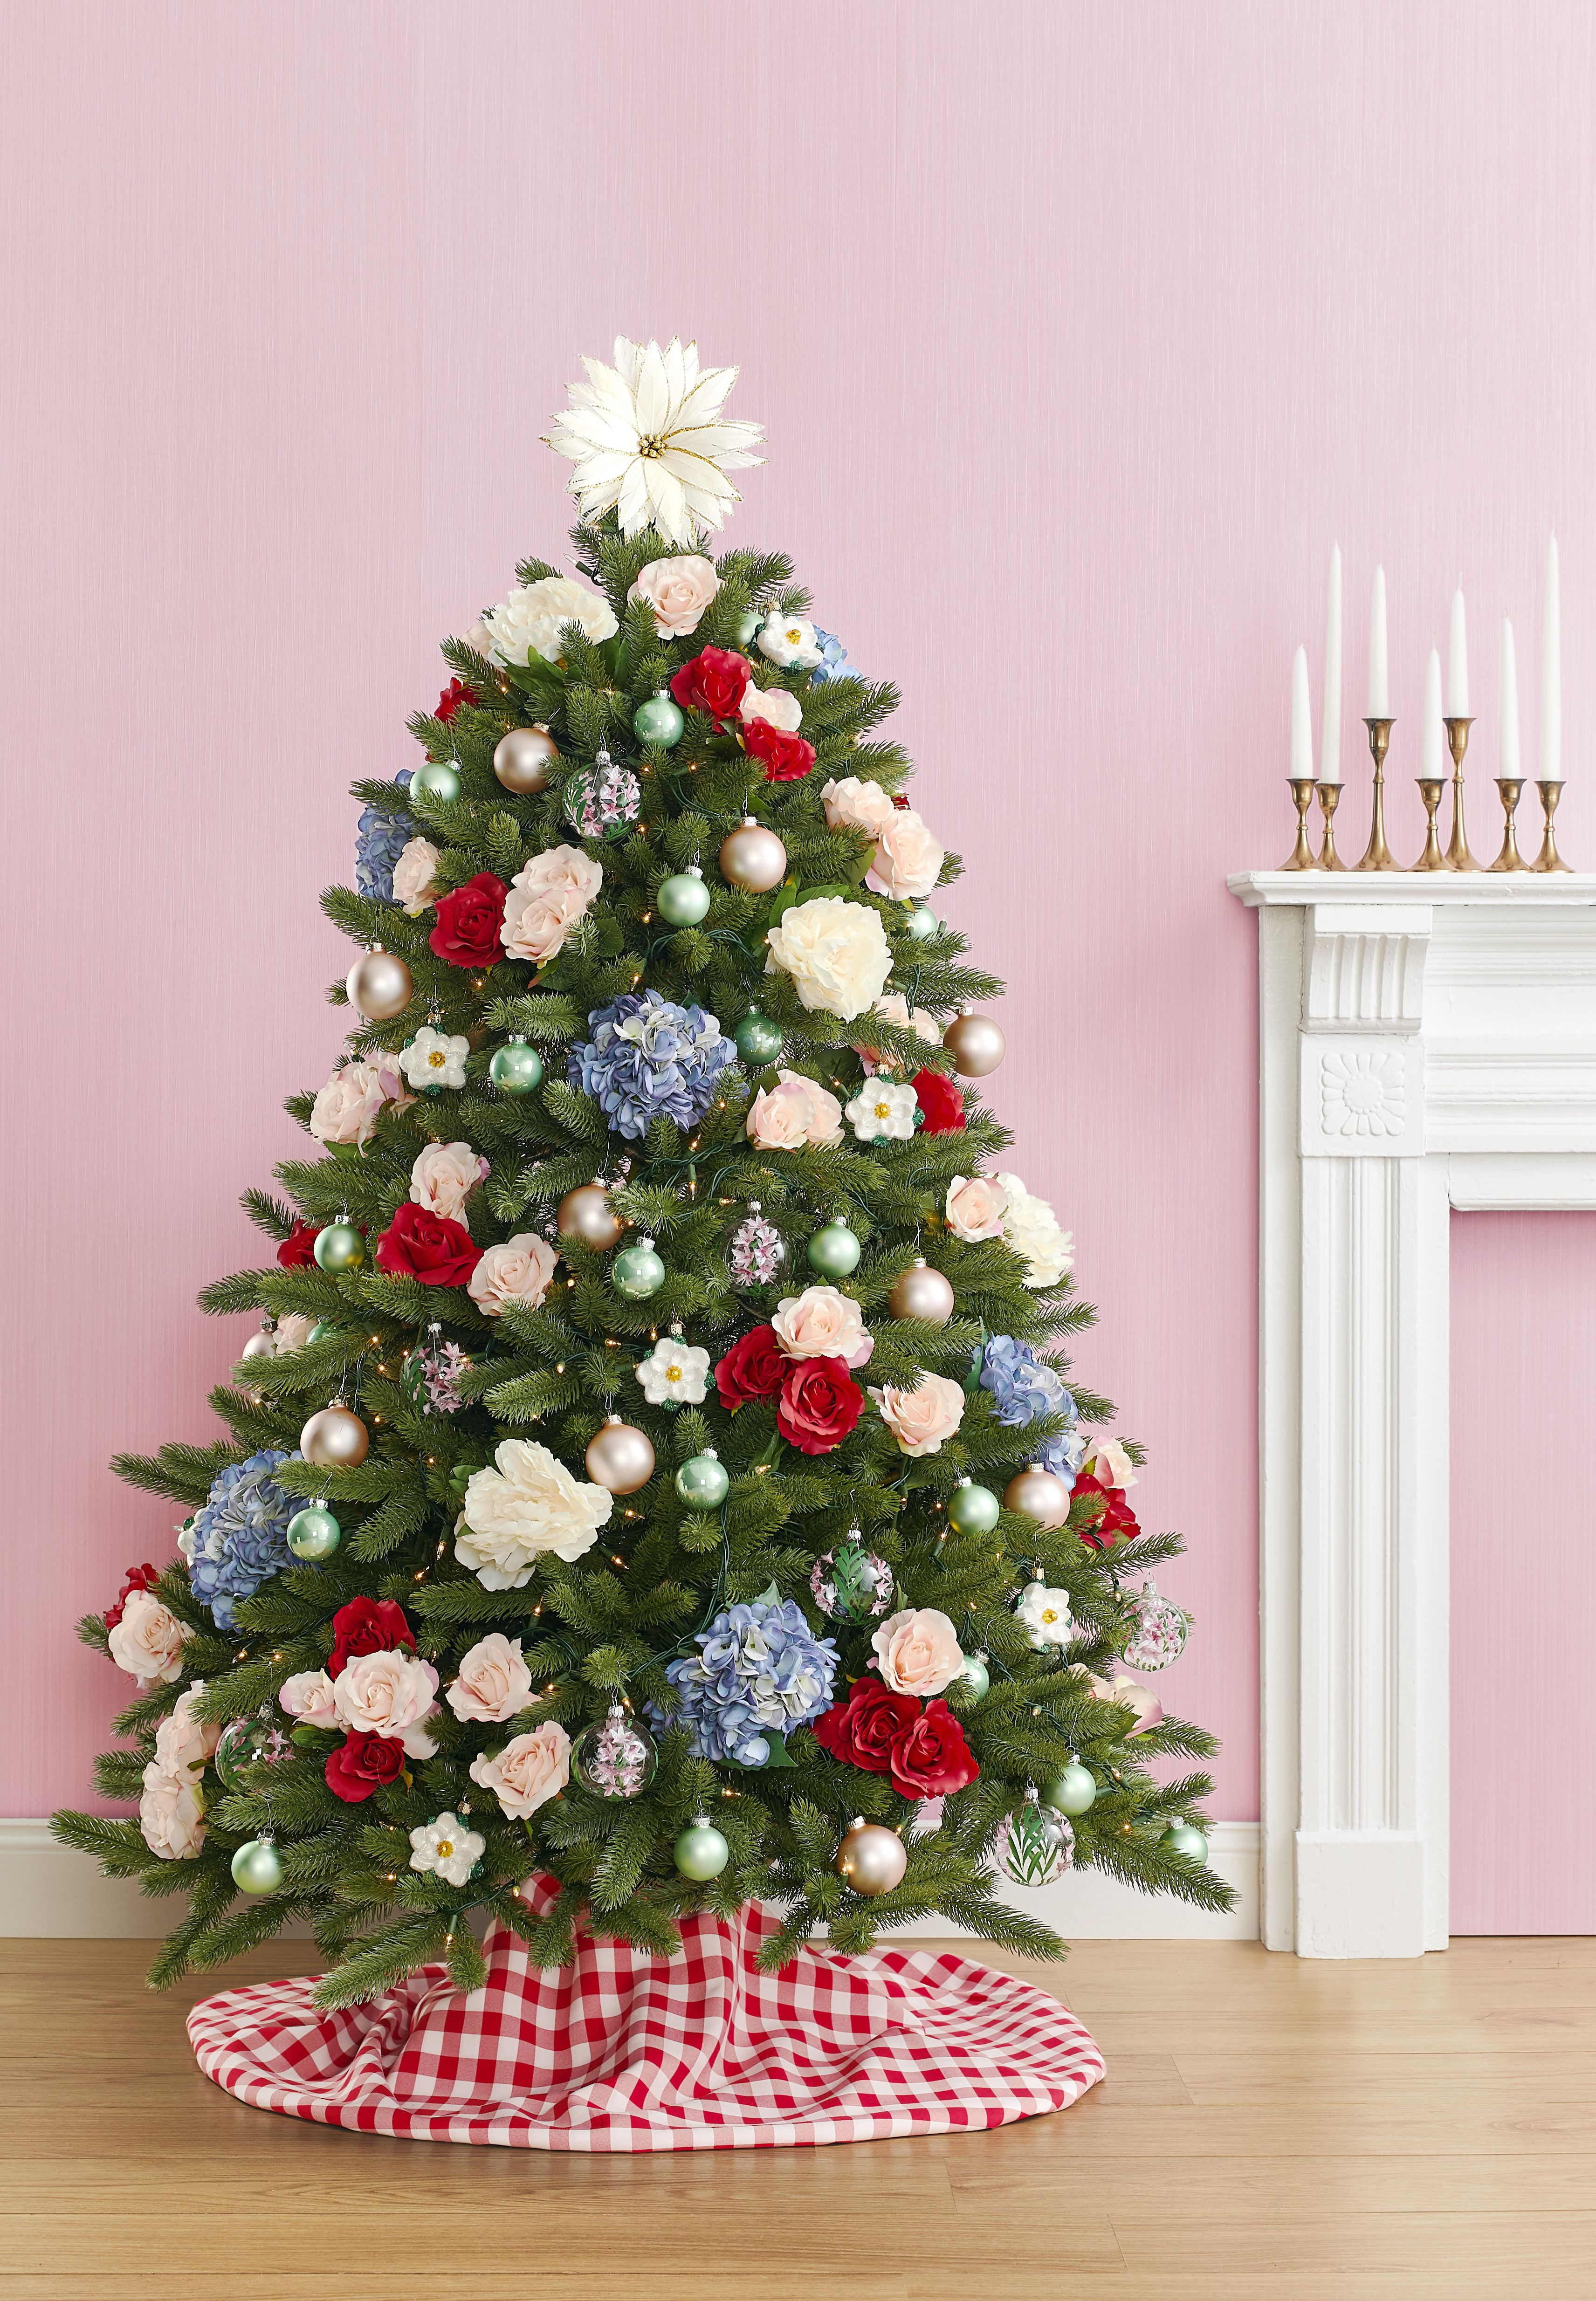 Pink Glass Tree Top Tree Topper Tree trim Tip on the Christmas tree Christmas Ornament Mercury Glass Christmas decorations Xmas Gift idea